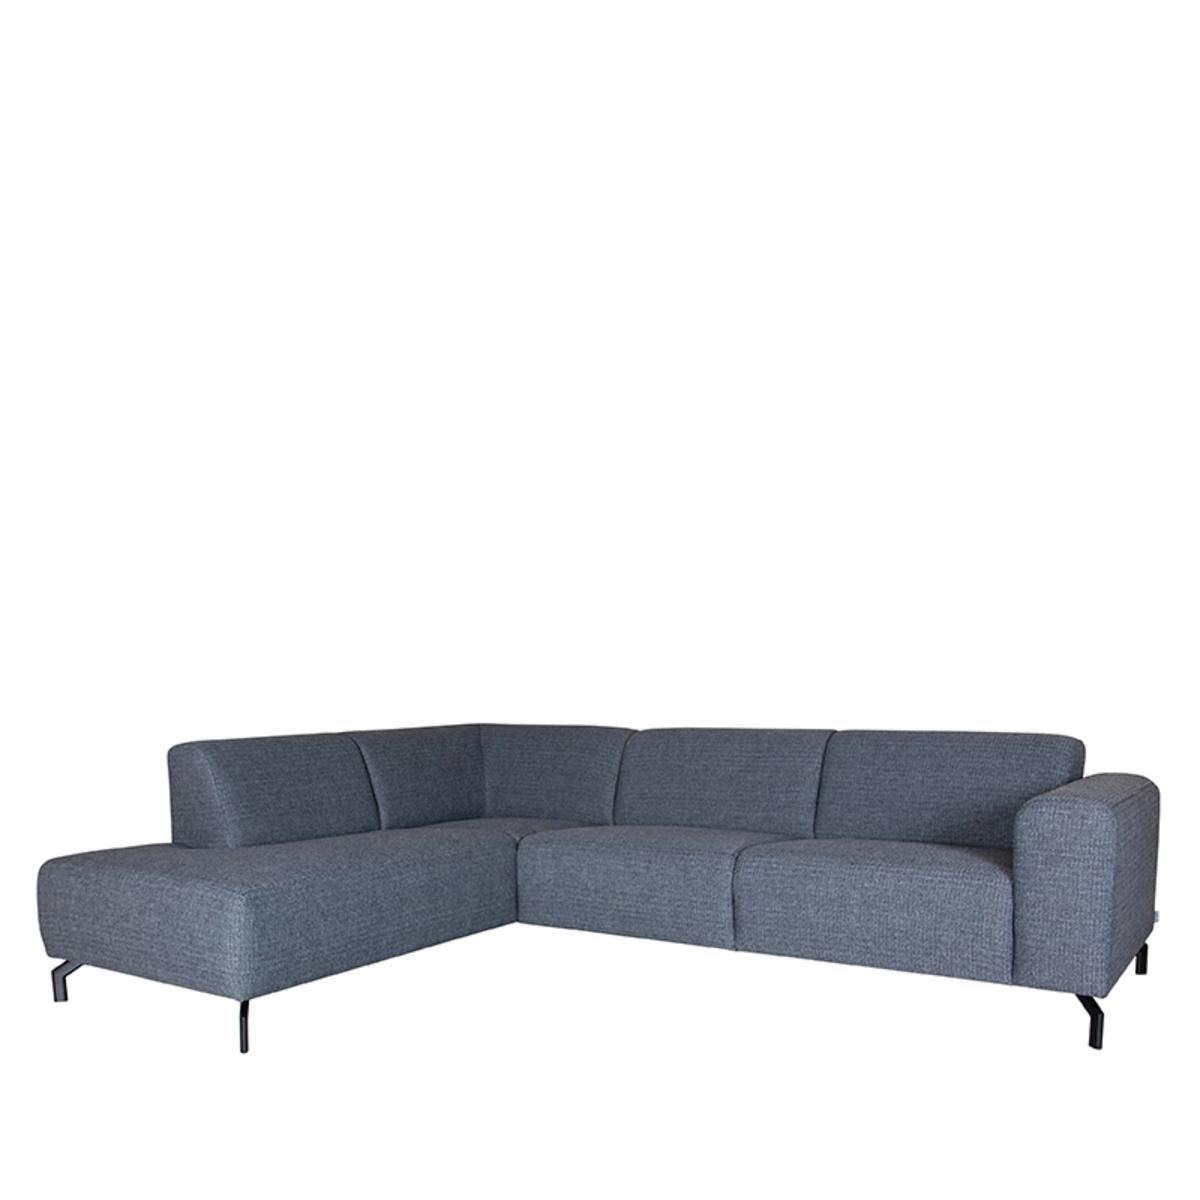 LABEL51 Bank Fano - Antraciet - Texture - Ottomane + 2,5-Zits